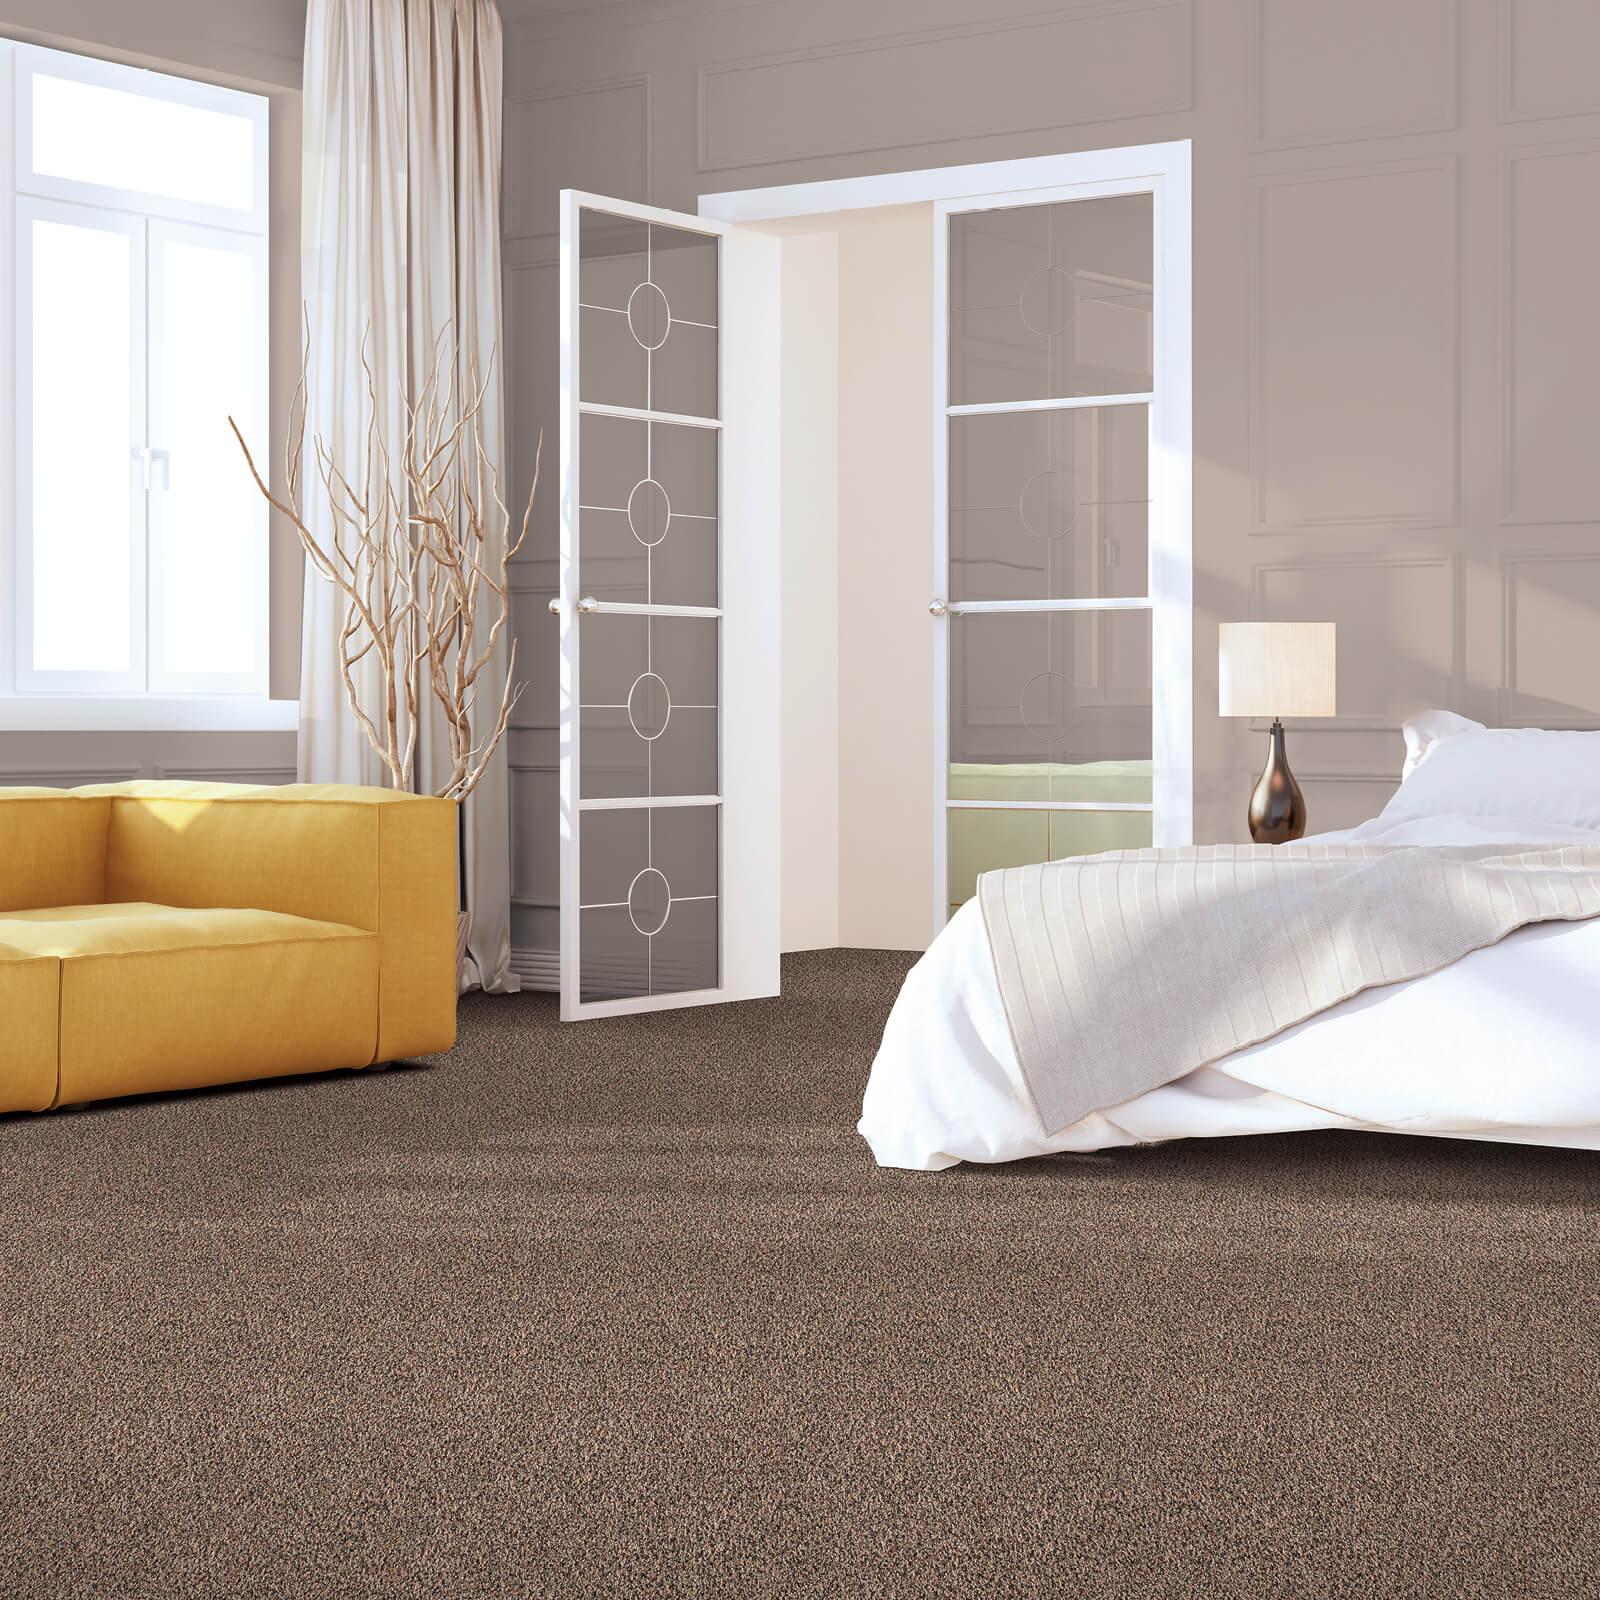 Impressive selection of Carpet | Flooring by Wilson's Carpet Plus